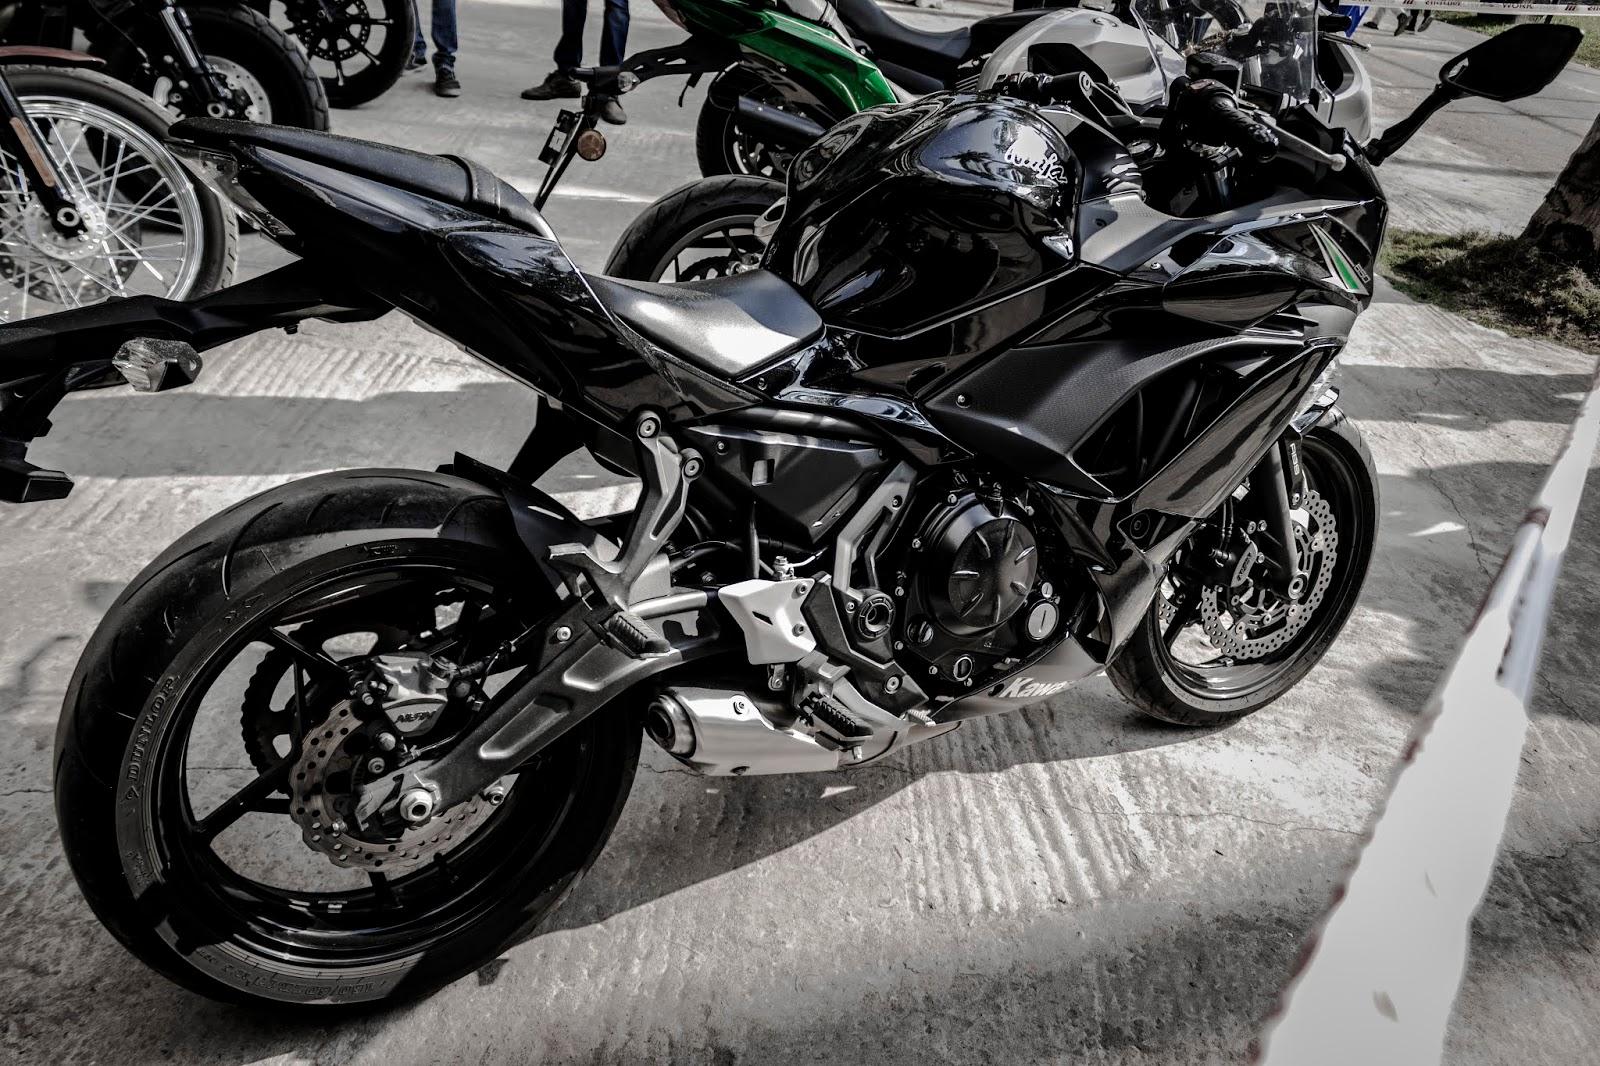 Kawasaki Ninja - ZX10R - Showcase in KL University ~Vesh Lab